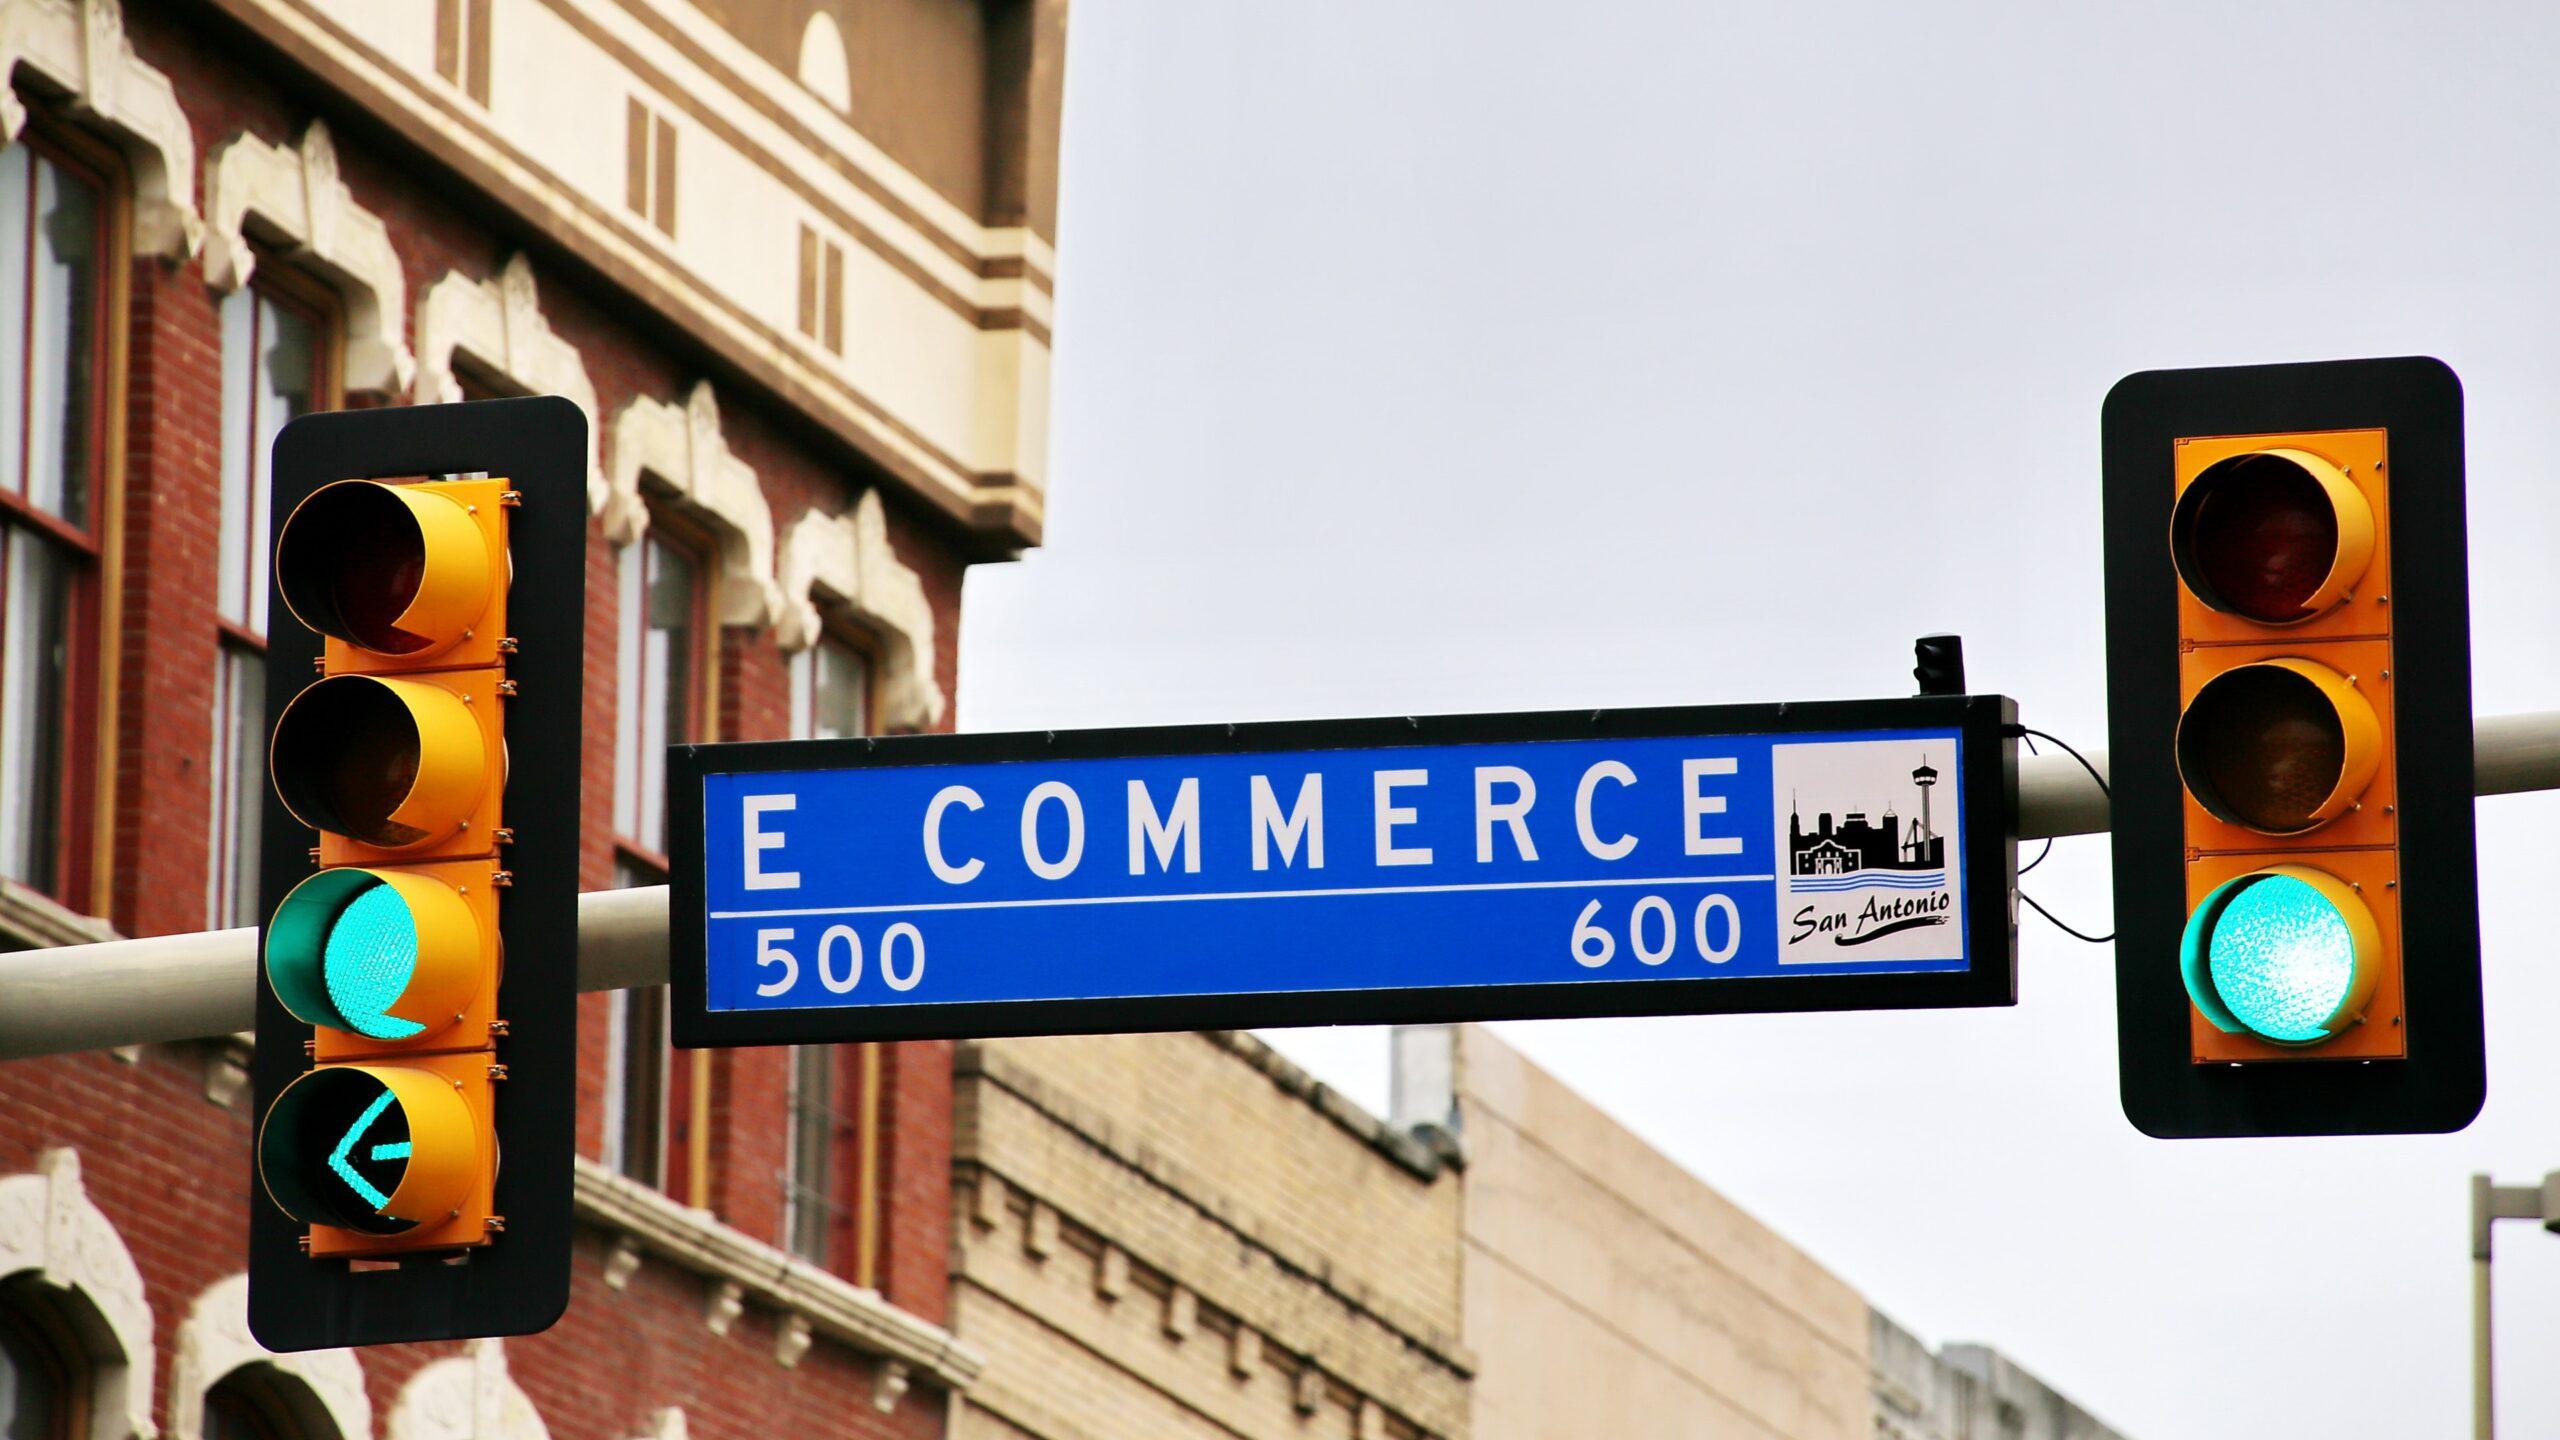 Entregas e-commerce